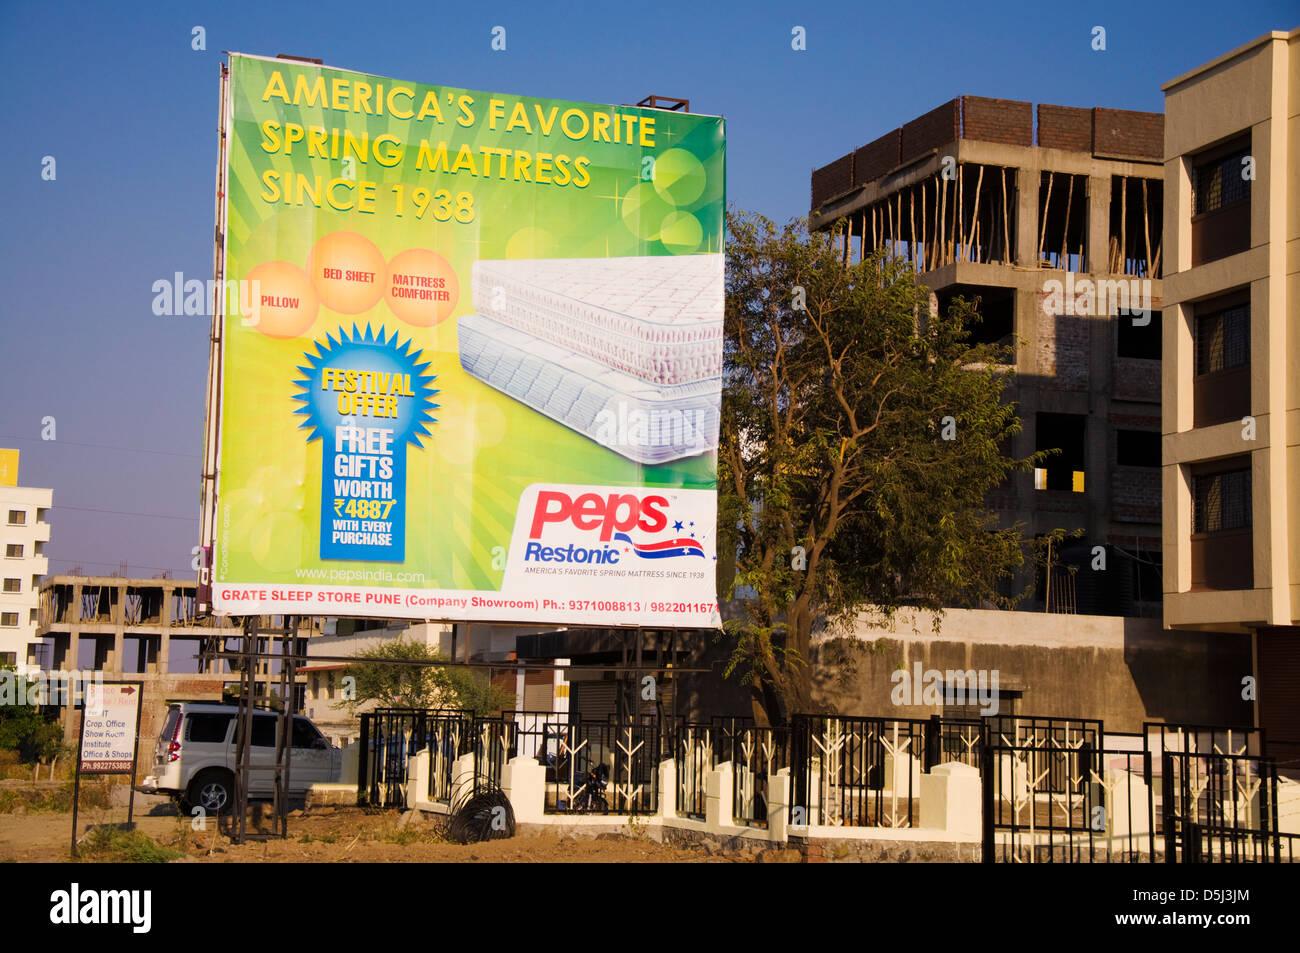 Advertising hoarding in Pune Maharashtra India for Peps Restonic mattresses - Stock Image